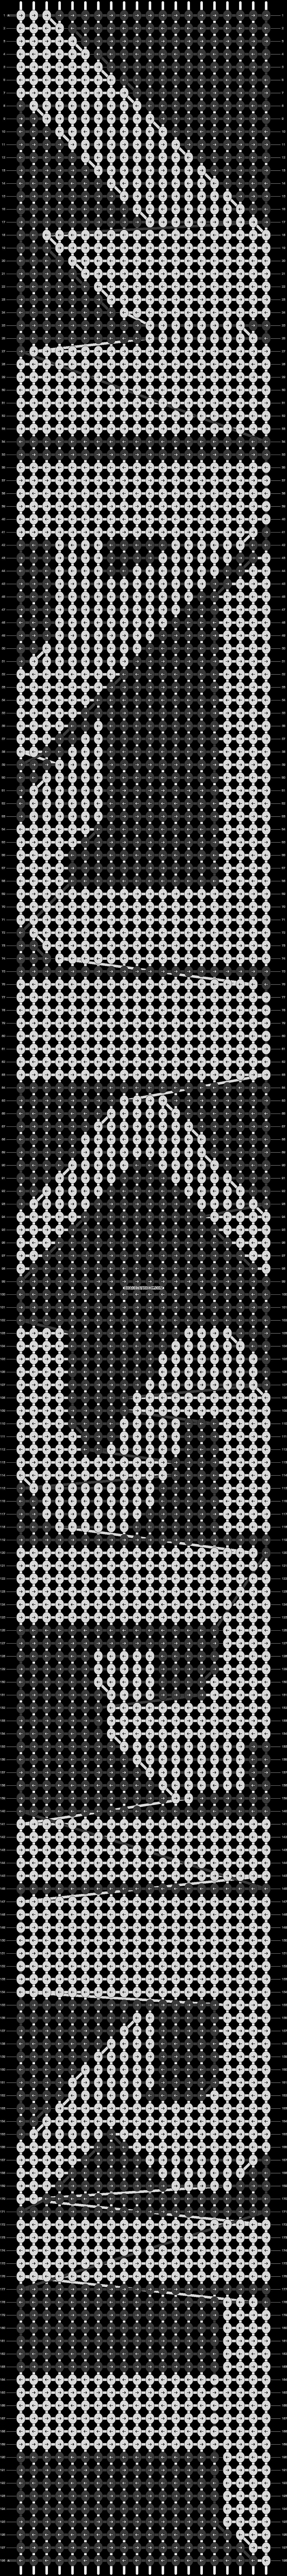 Alpha pattern #13958 pattern